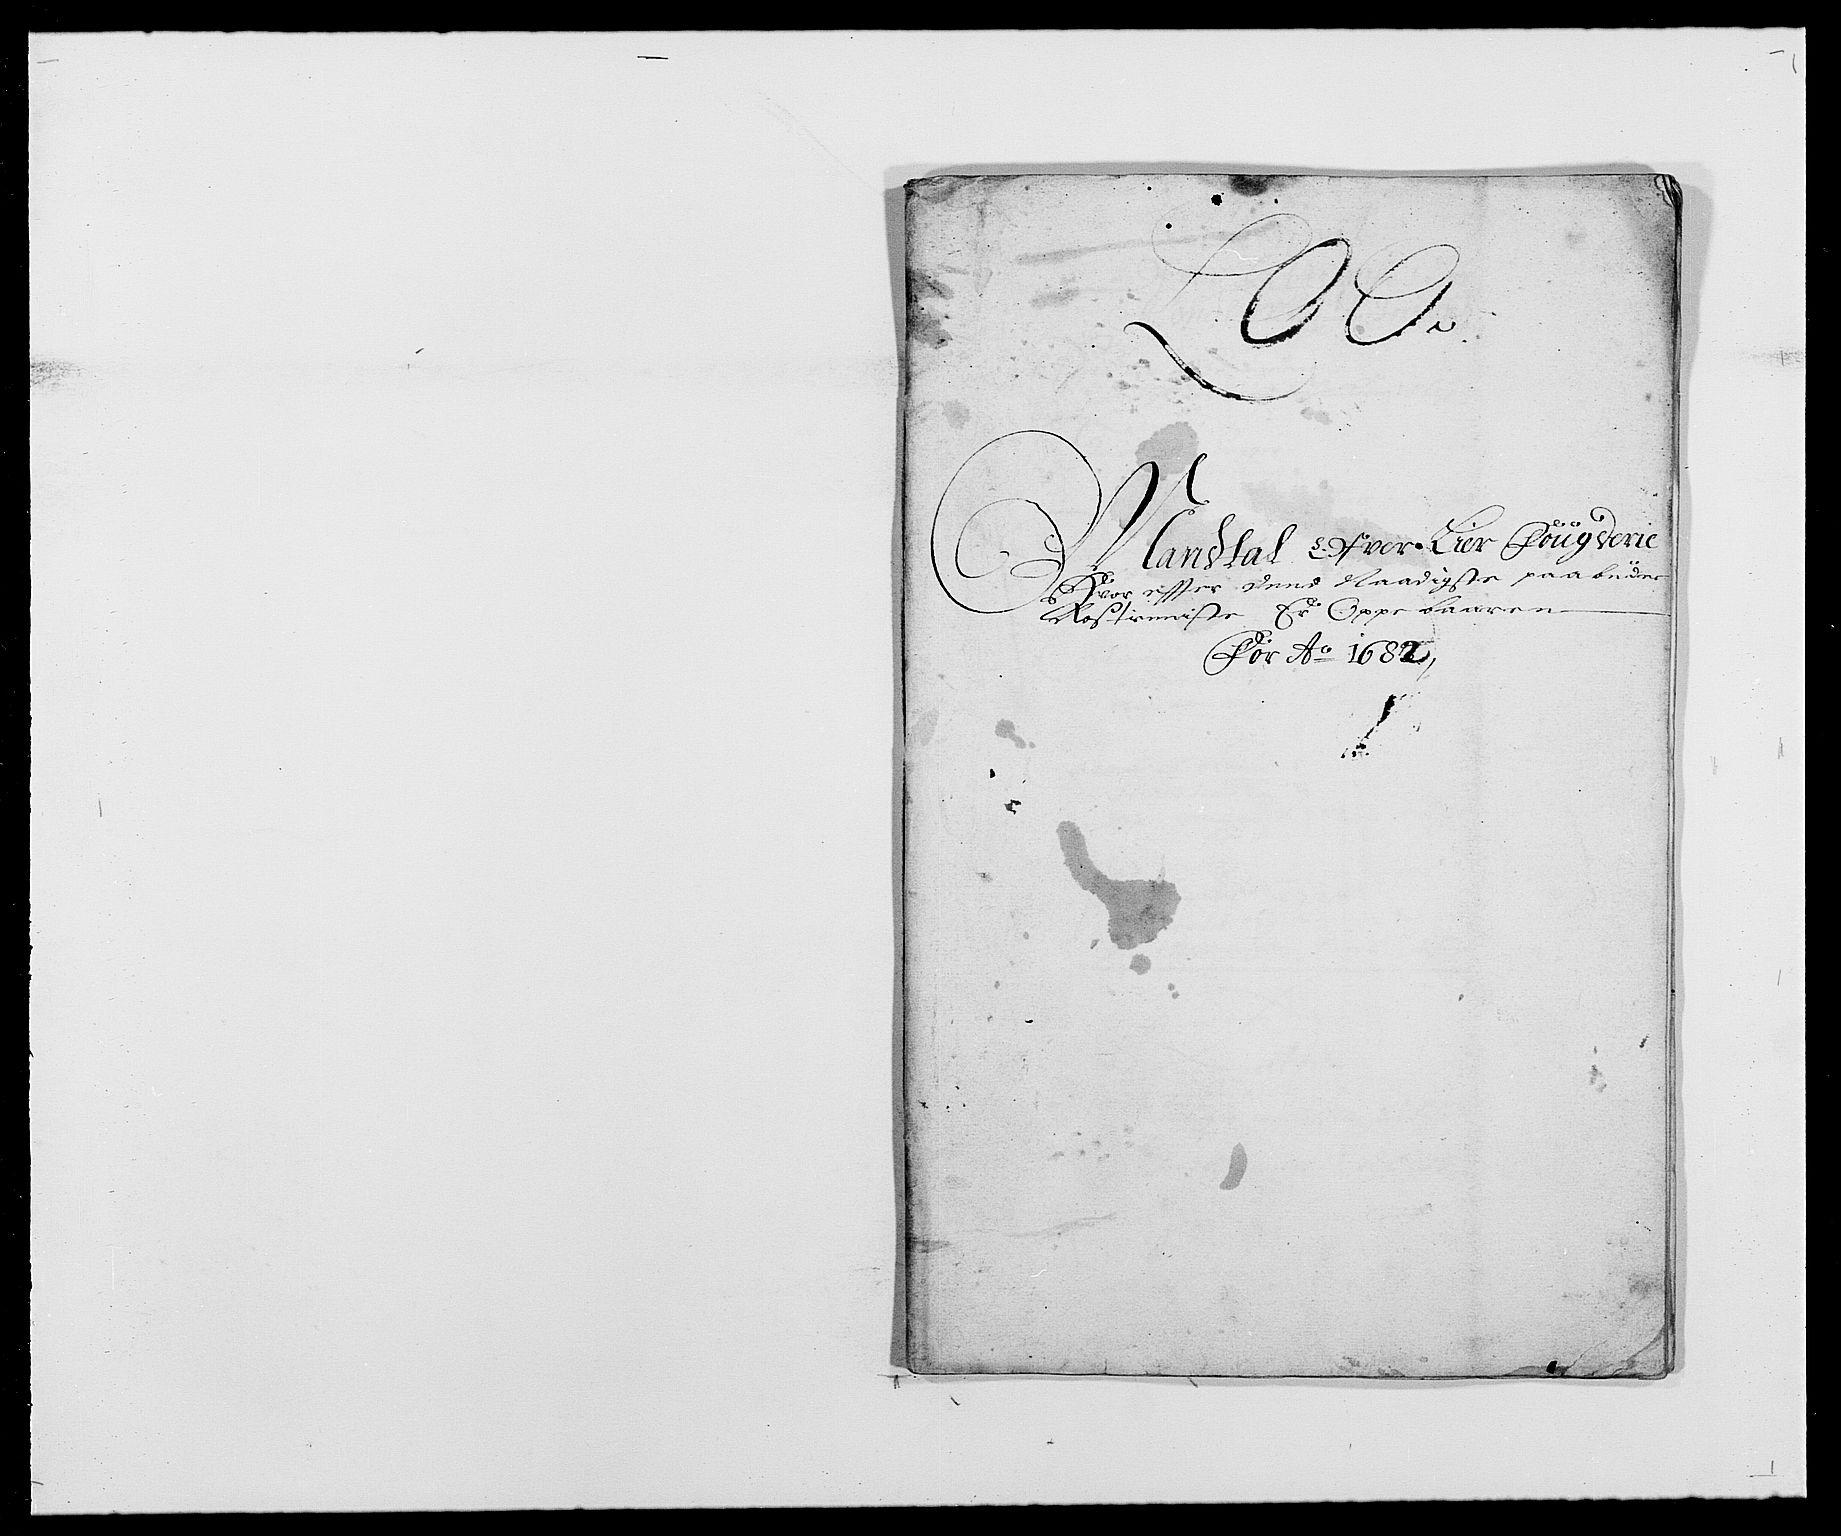 RA, Rentekammeret inntil 1814, Reviderte regnskaper, Fogderegnskap, R27/L1686: Fogderegnskap Lier, 1678-1686, s. 427